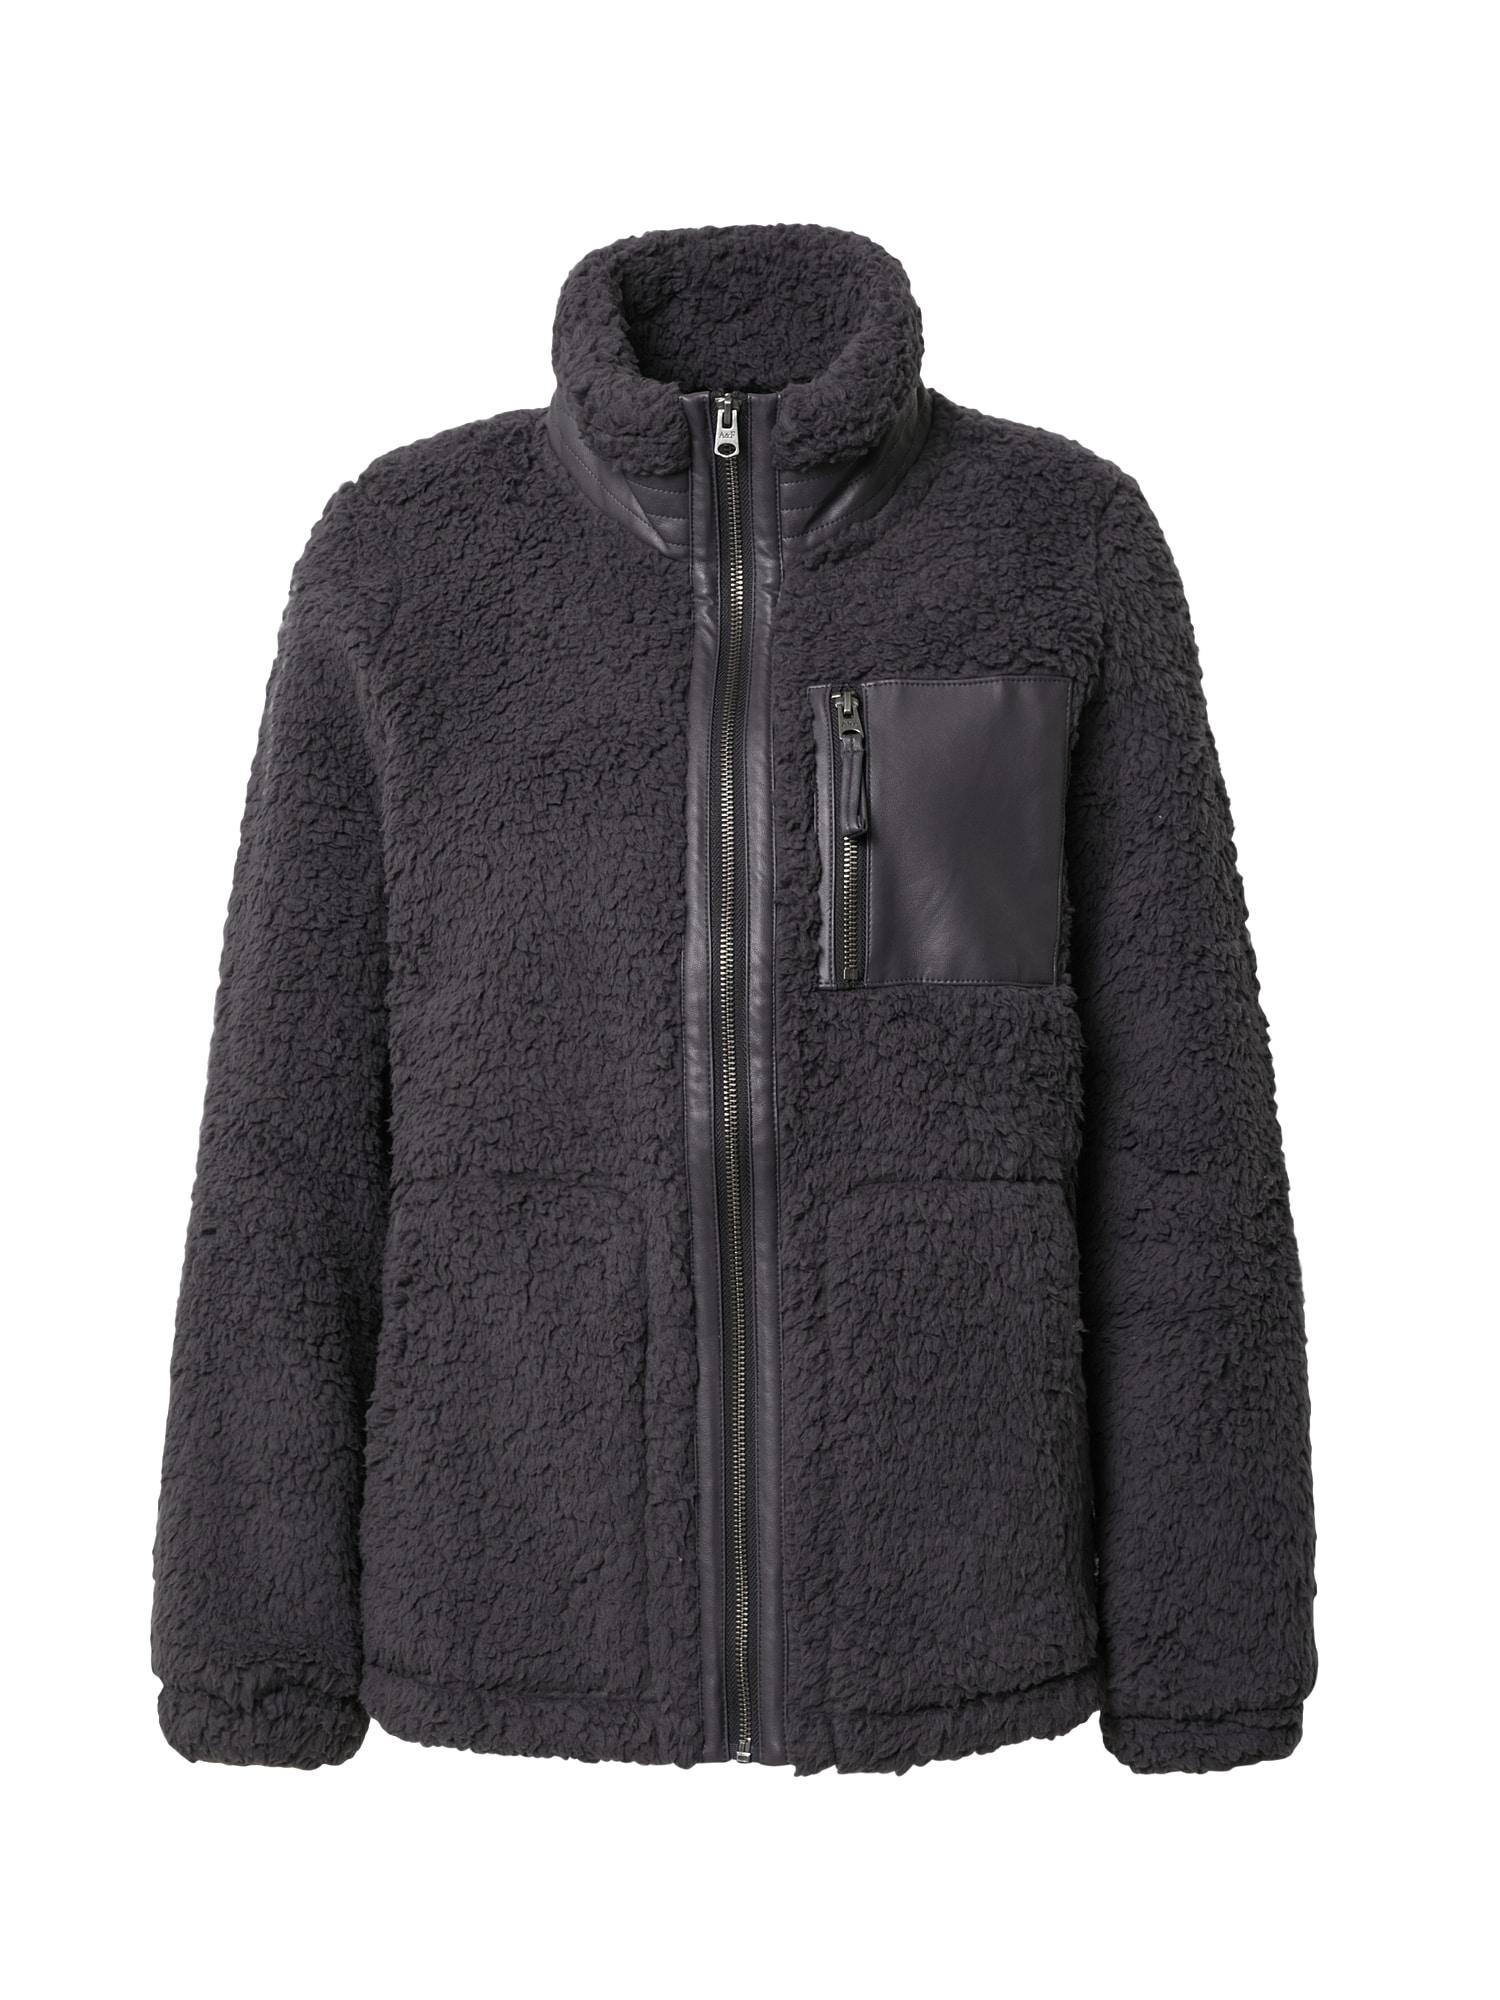 Abercrombie & Fitch Flisinis džemperis pilka